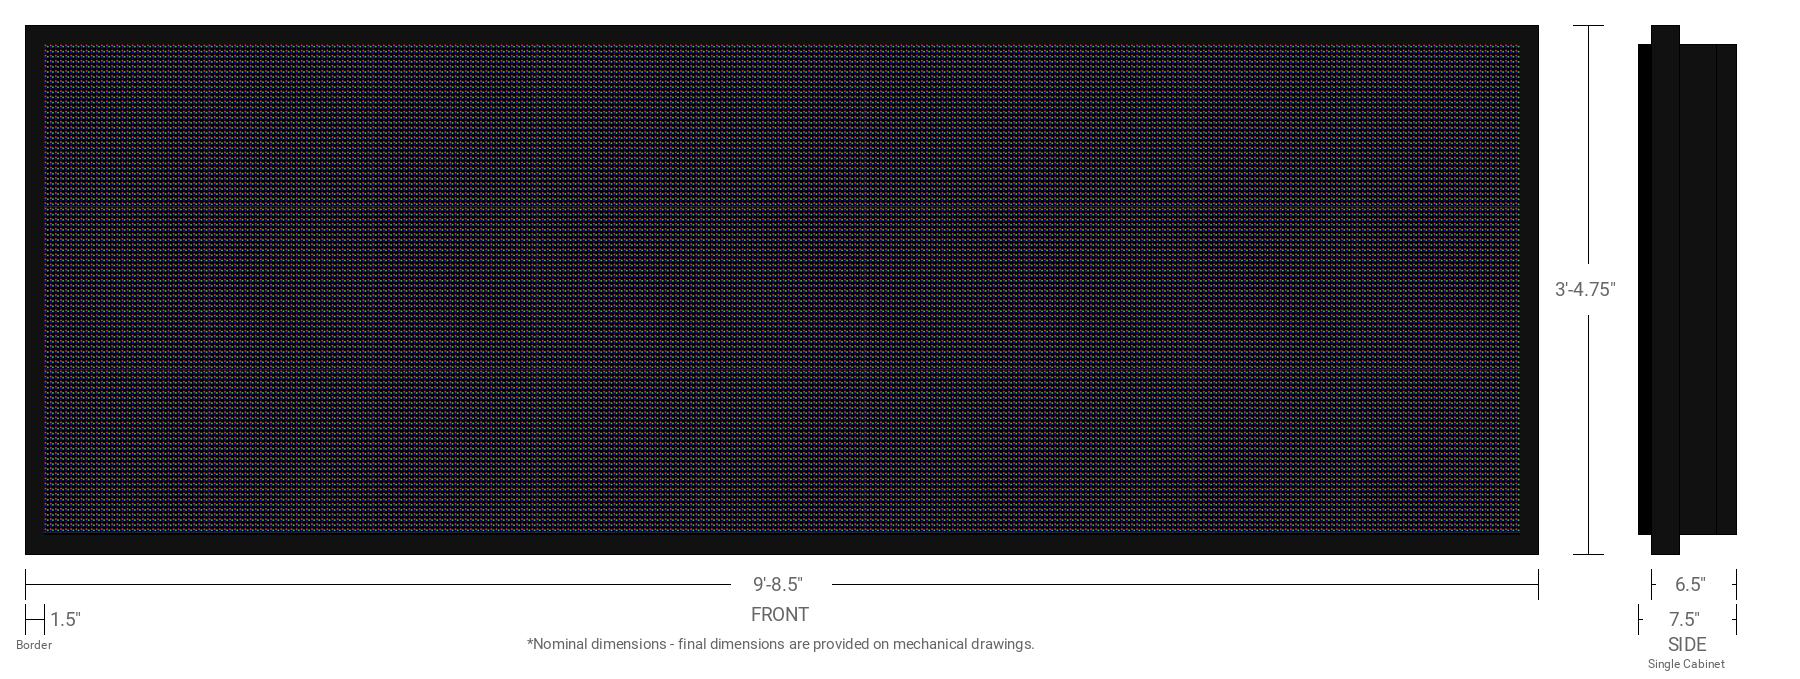 Polaris 10mm 96x288 Single Sided Full Color LED Display